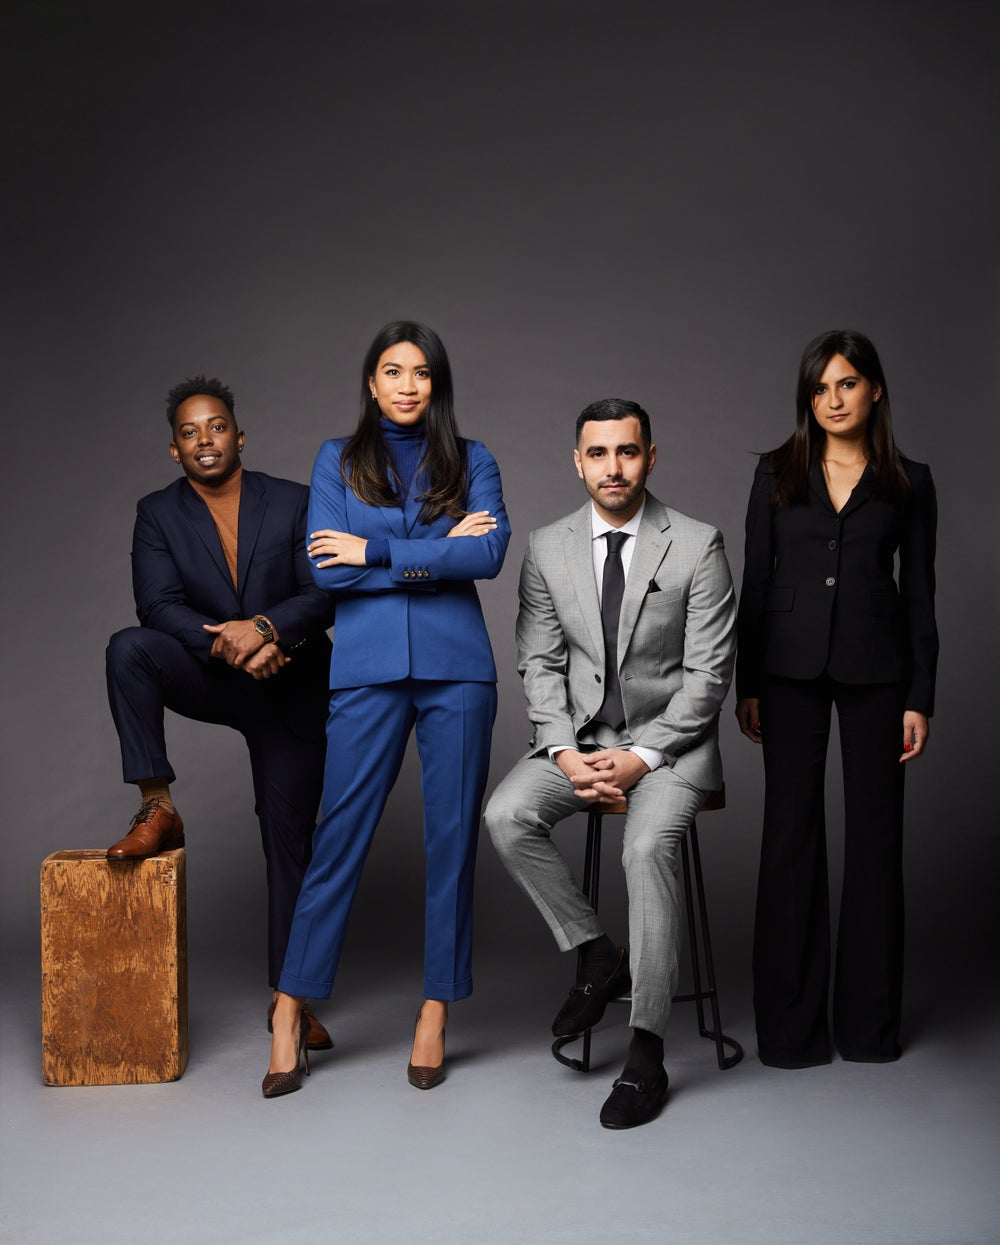 From left to right, Drop Head of sales Quincy Taylor, CEO Vanessa Gabriel, CTO Marc Lopez and CPO Jade Gabriel.